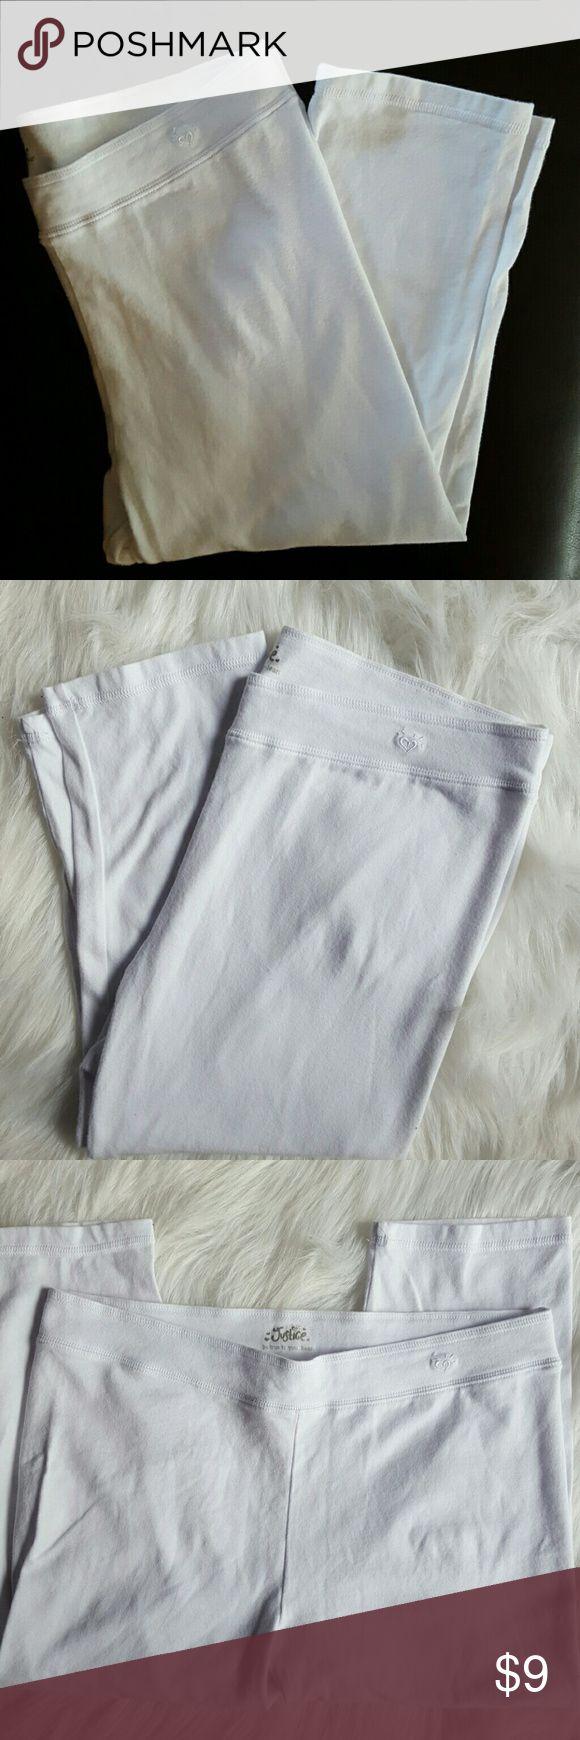 Justice white capri leggings NWOT size 18 Justice for Girls size 18 white capri leggings. Never worn. Justice Bottoms Leggings